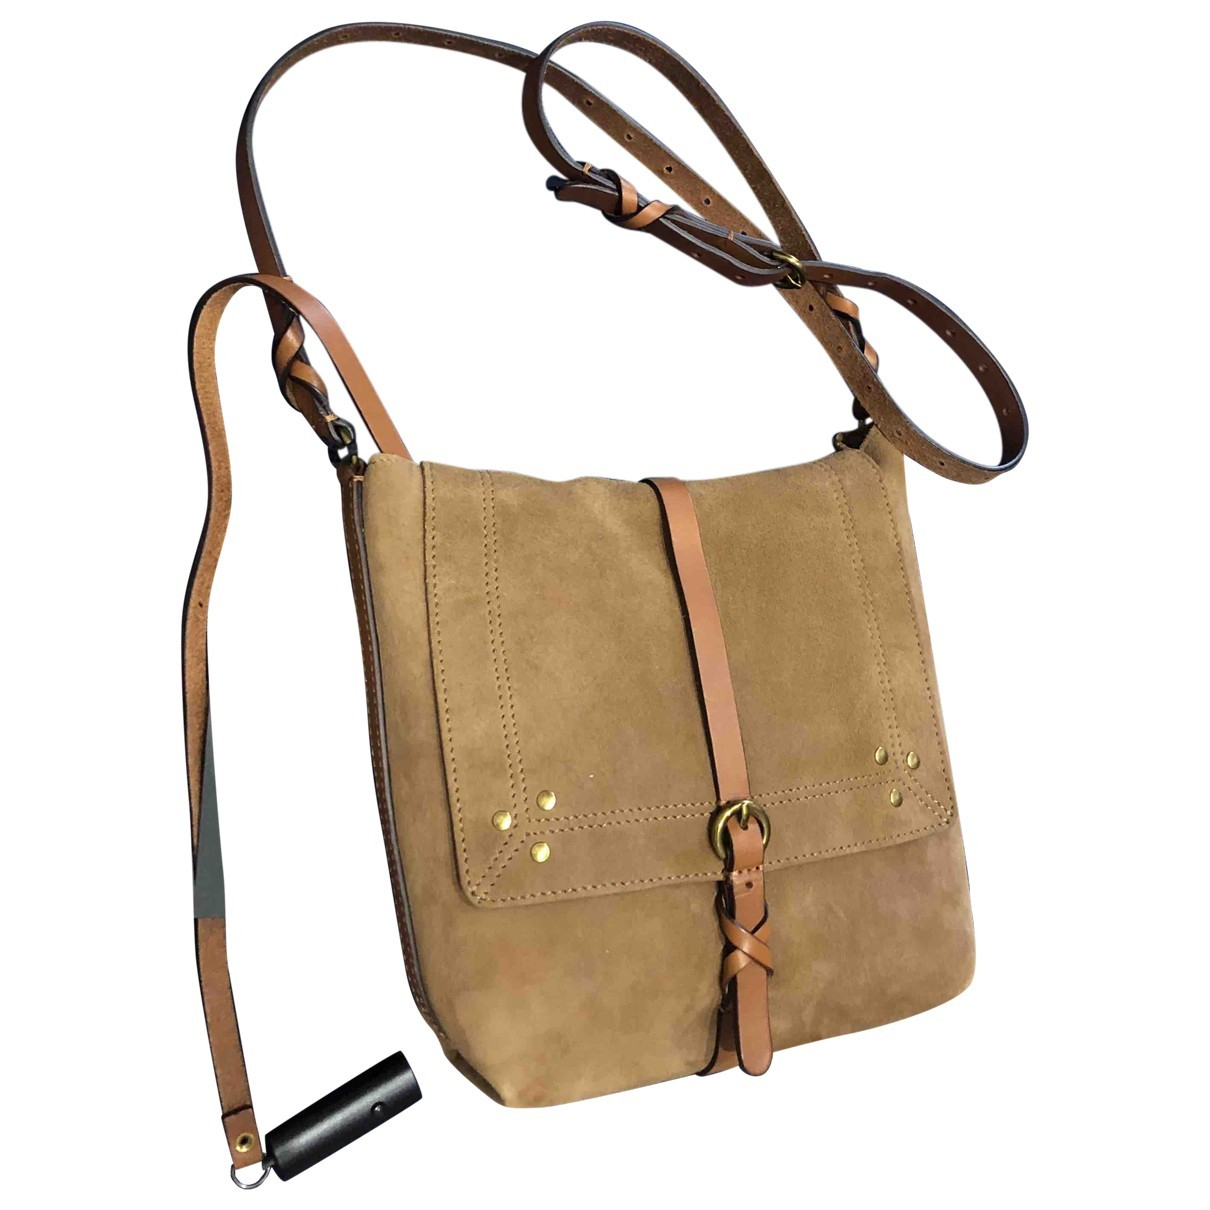 Jerome Dreyfuss \N Beige Suede handbag for Women \N